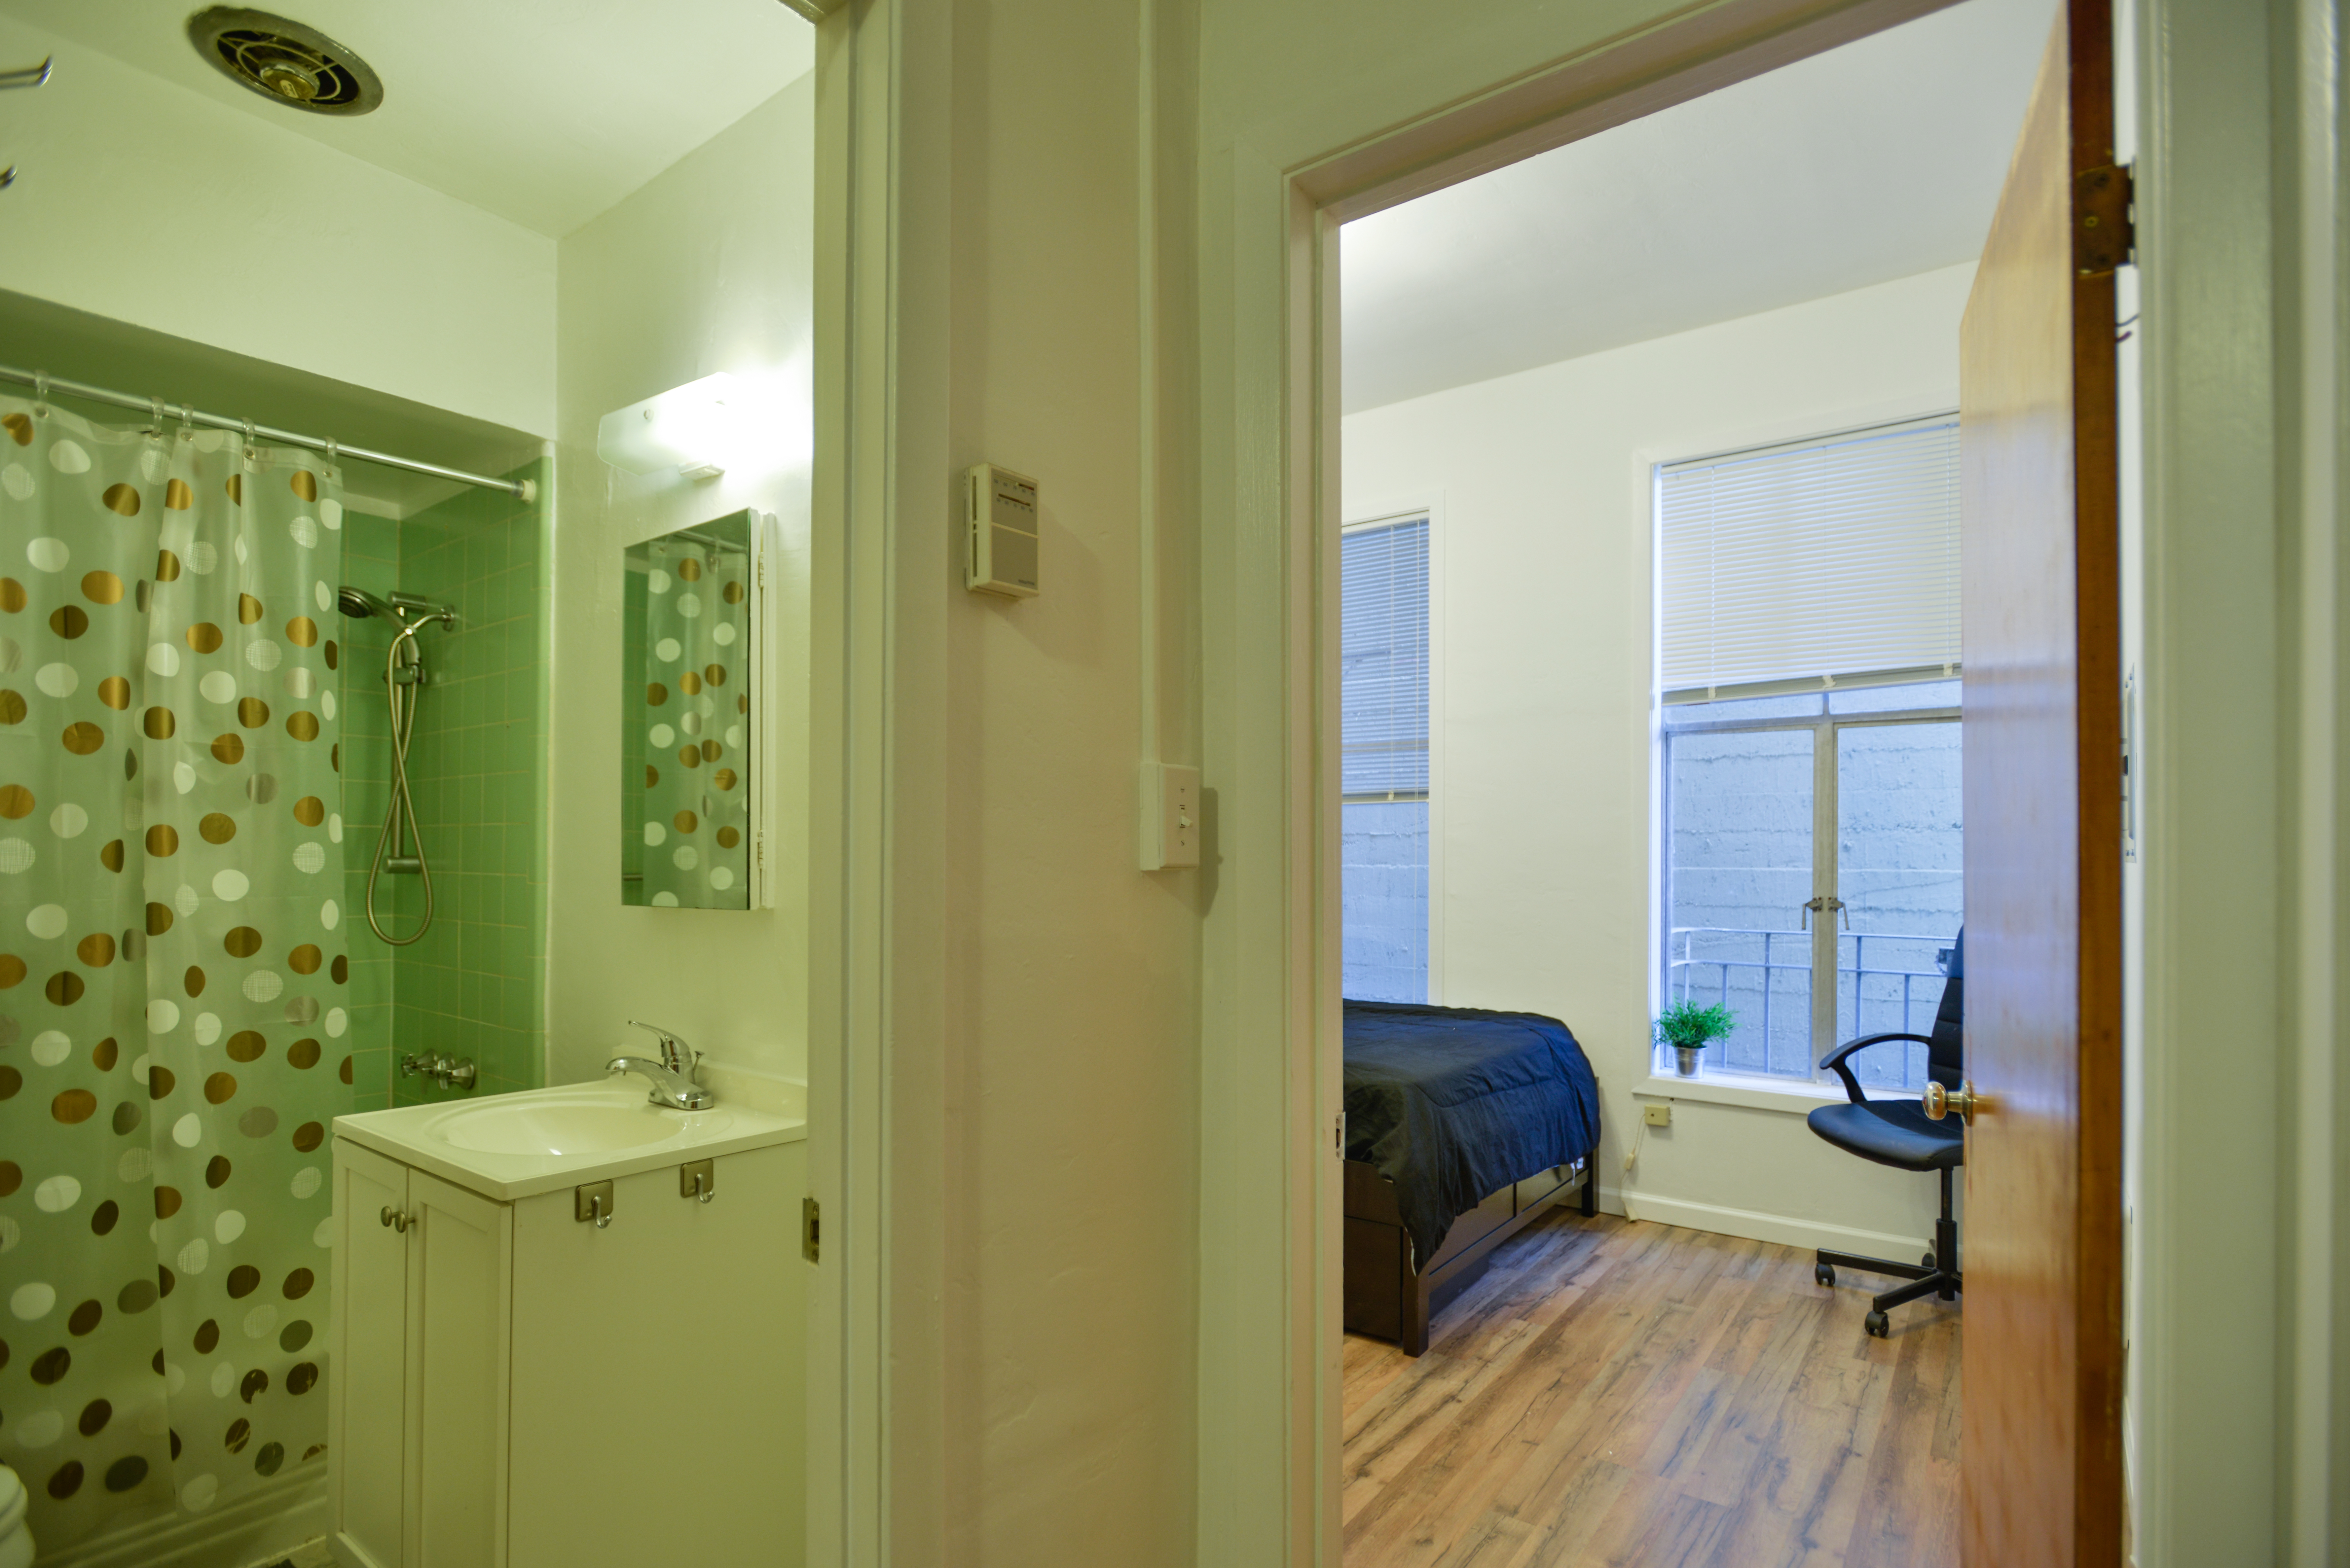 RESTOOM_BATHTUB_BEDROOM_TWIN BED